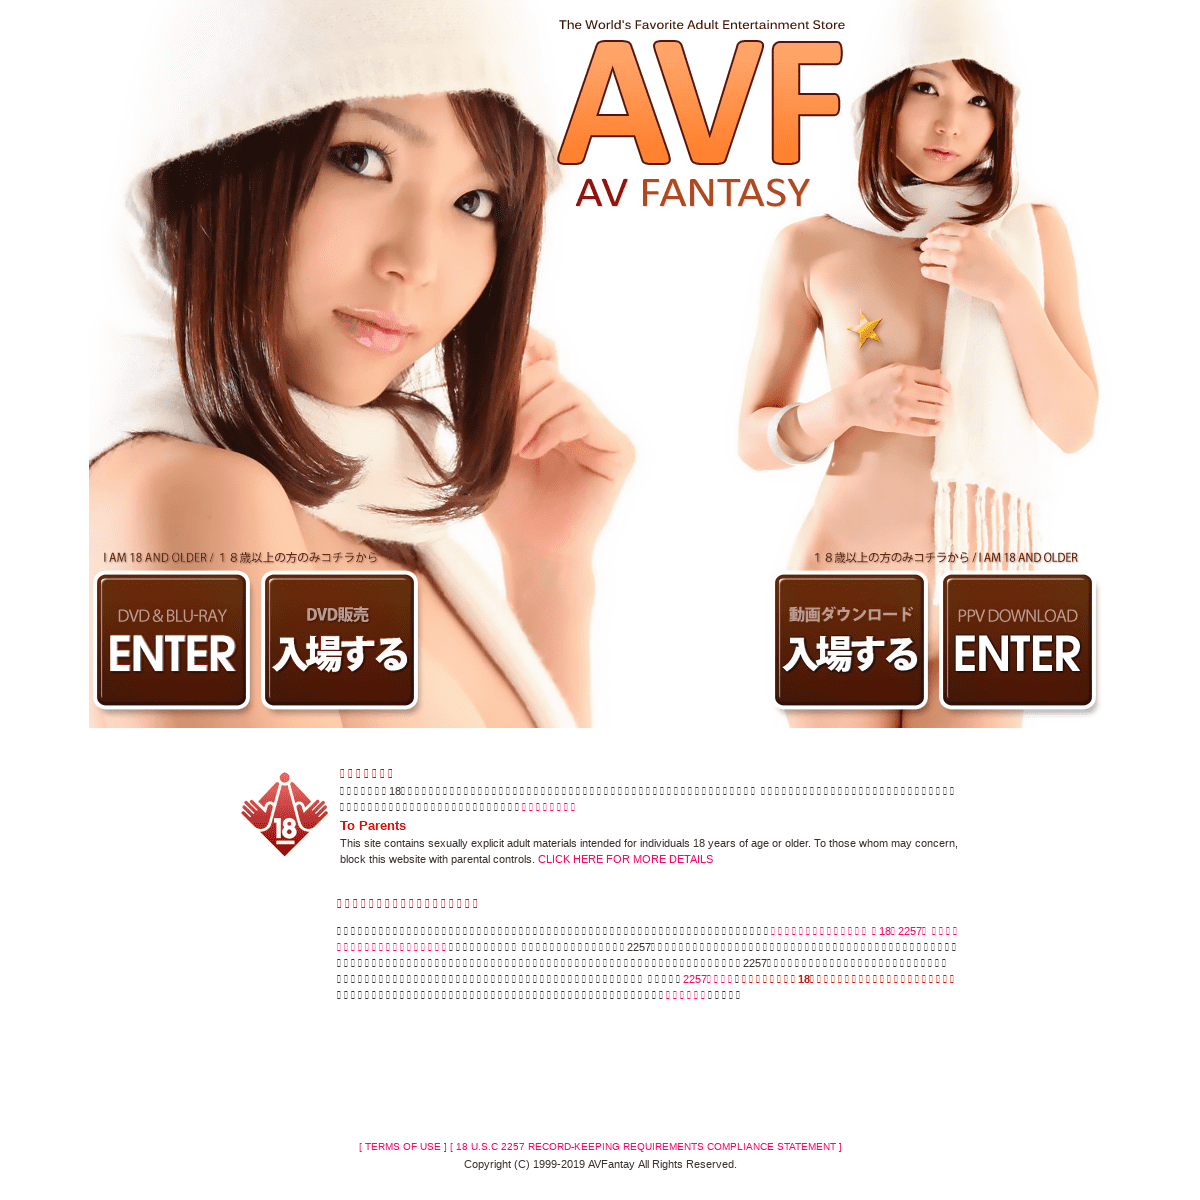 ArchiveBay.com - avfantasy.com - AVファンタジー - 世界最大のジャポルノストア